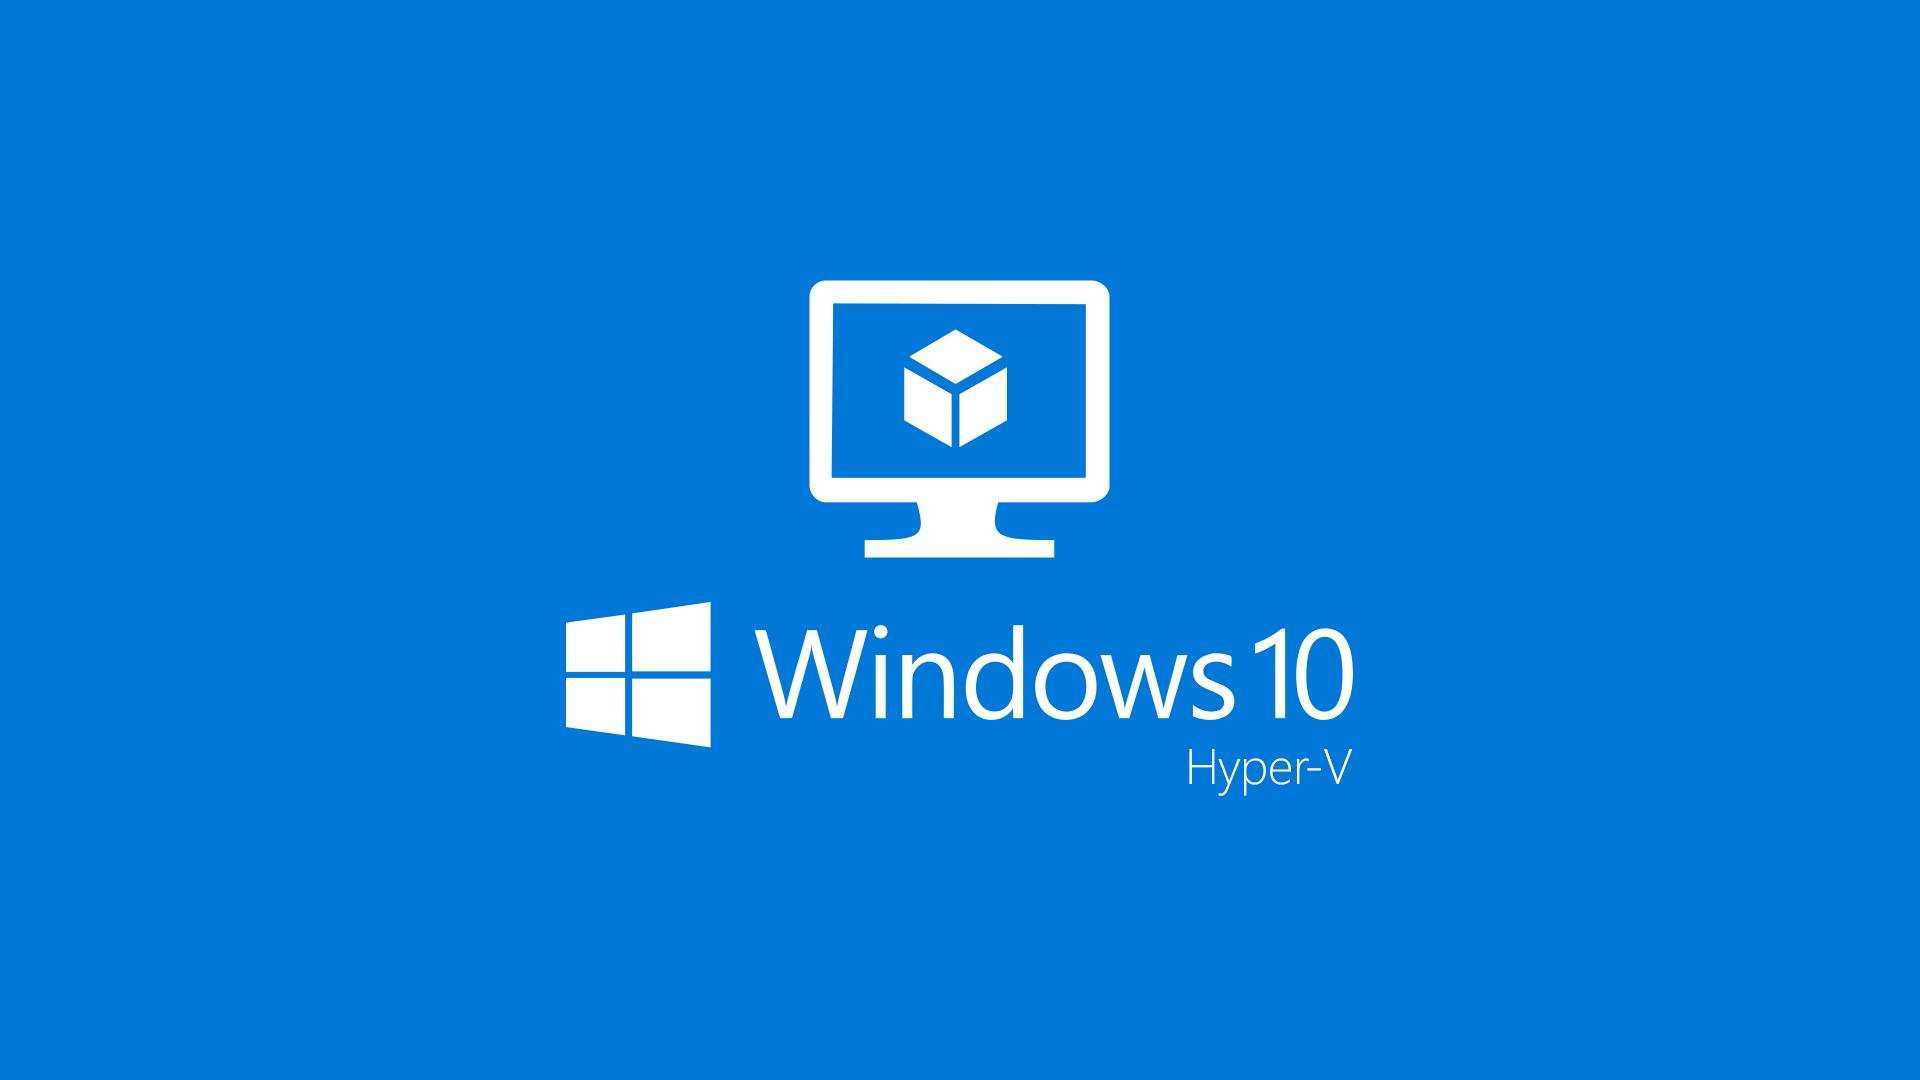 Fall Creators Update Wallpaper Novit 224 Introdotte In Client Hyper V In Windows 10 Fall